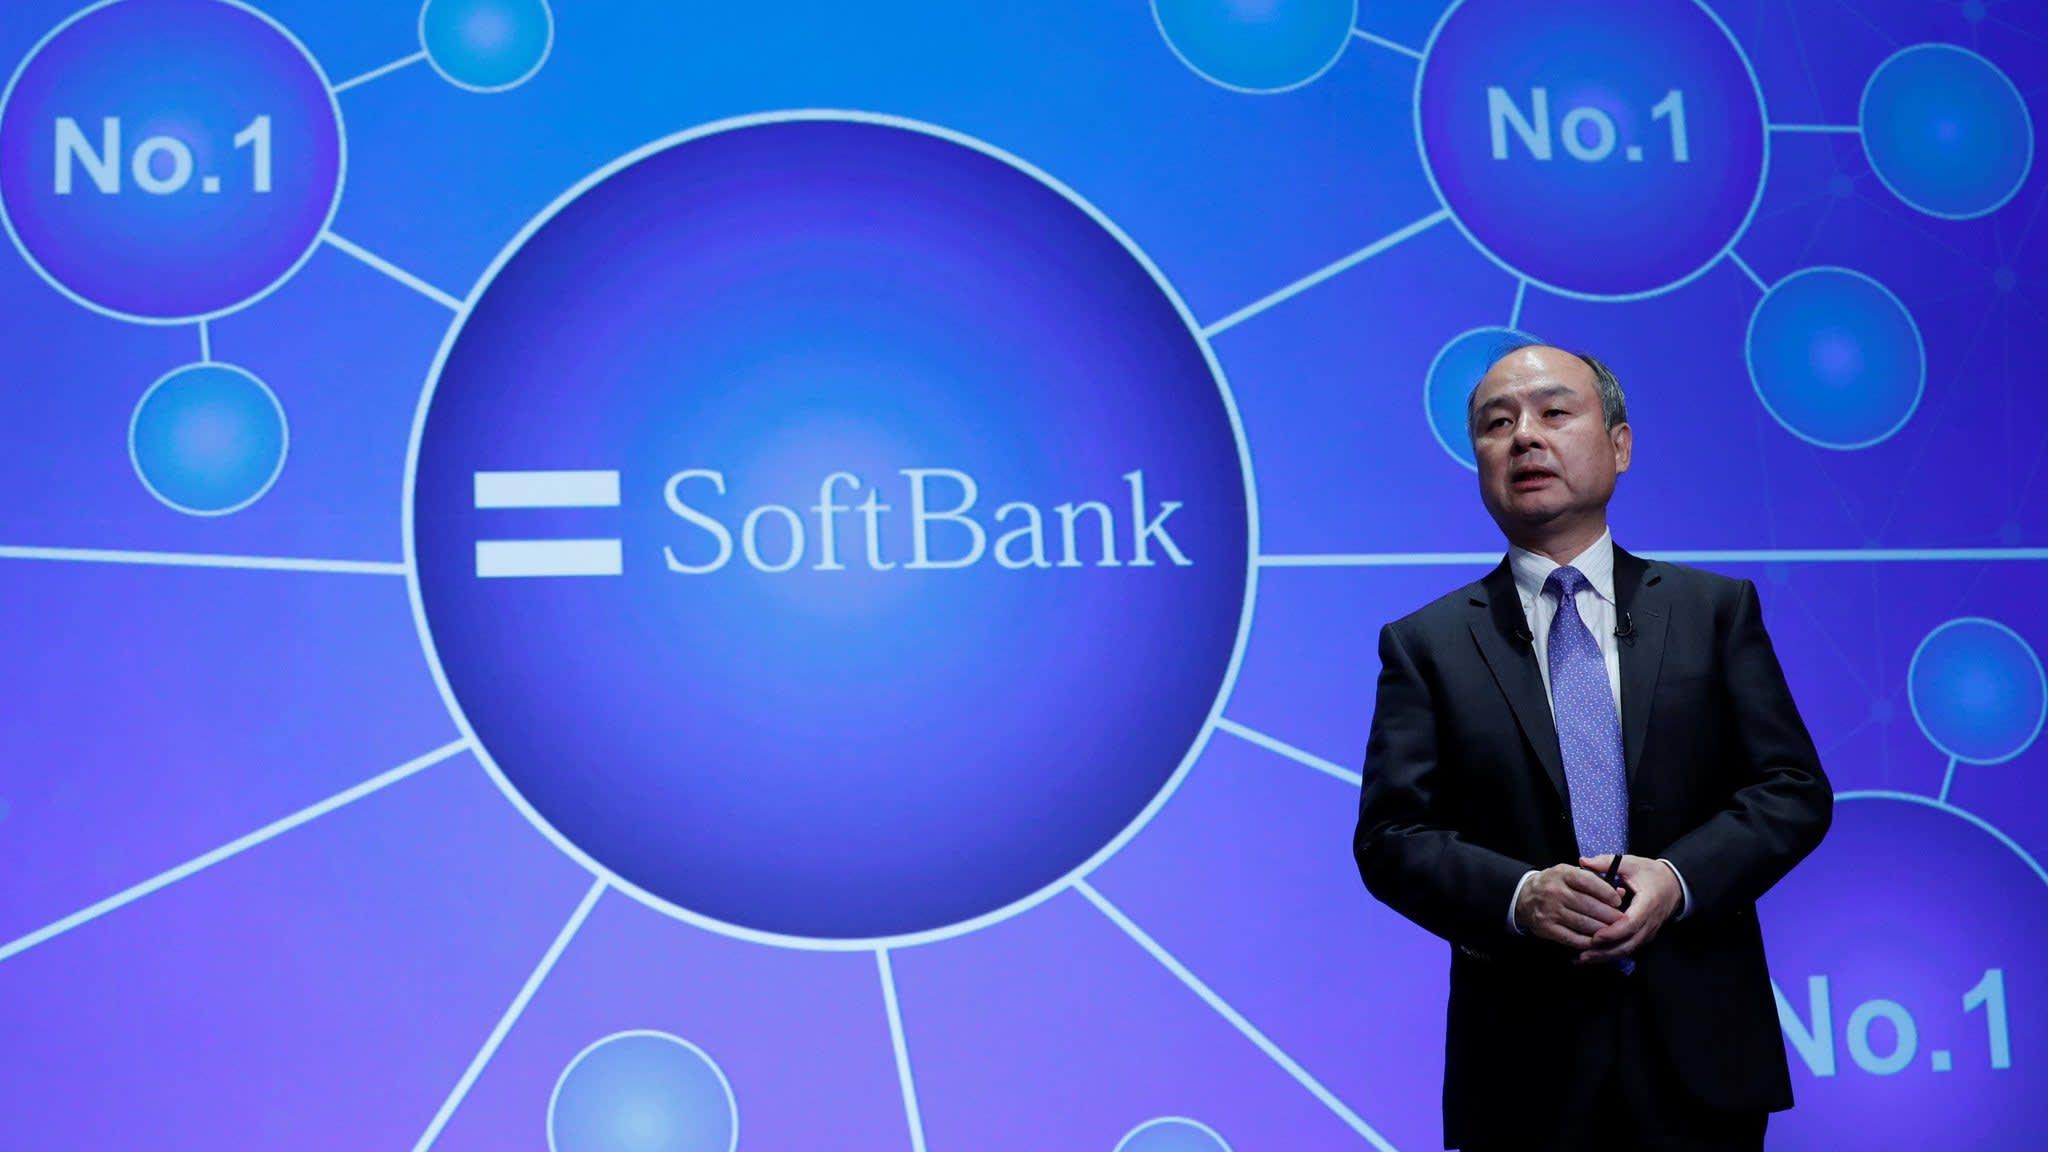 SoftBank reaffirms investment ties with Saudi Arabia